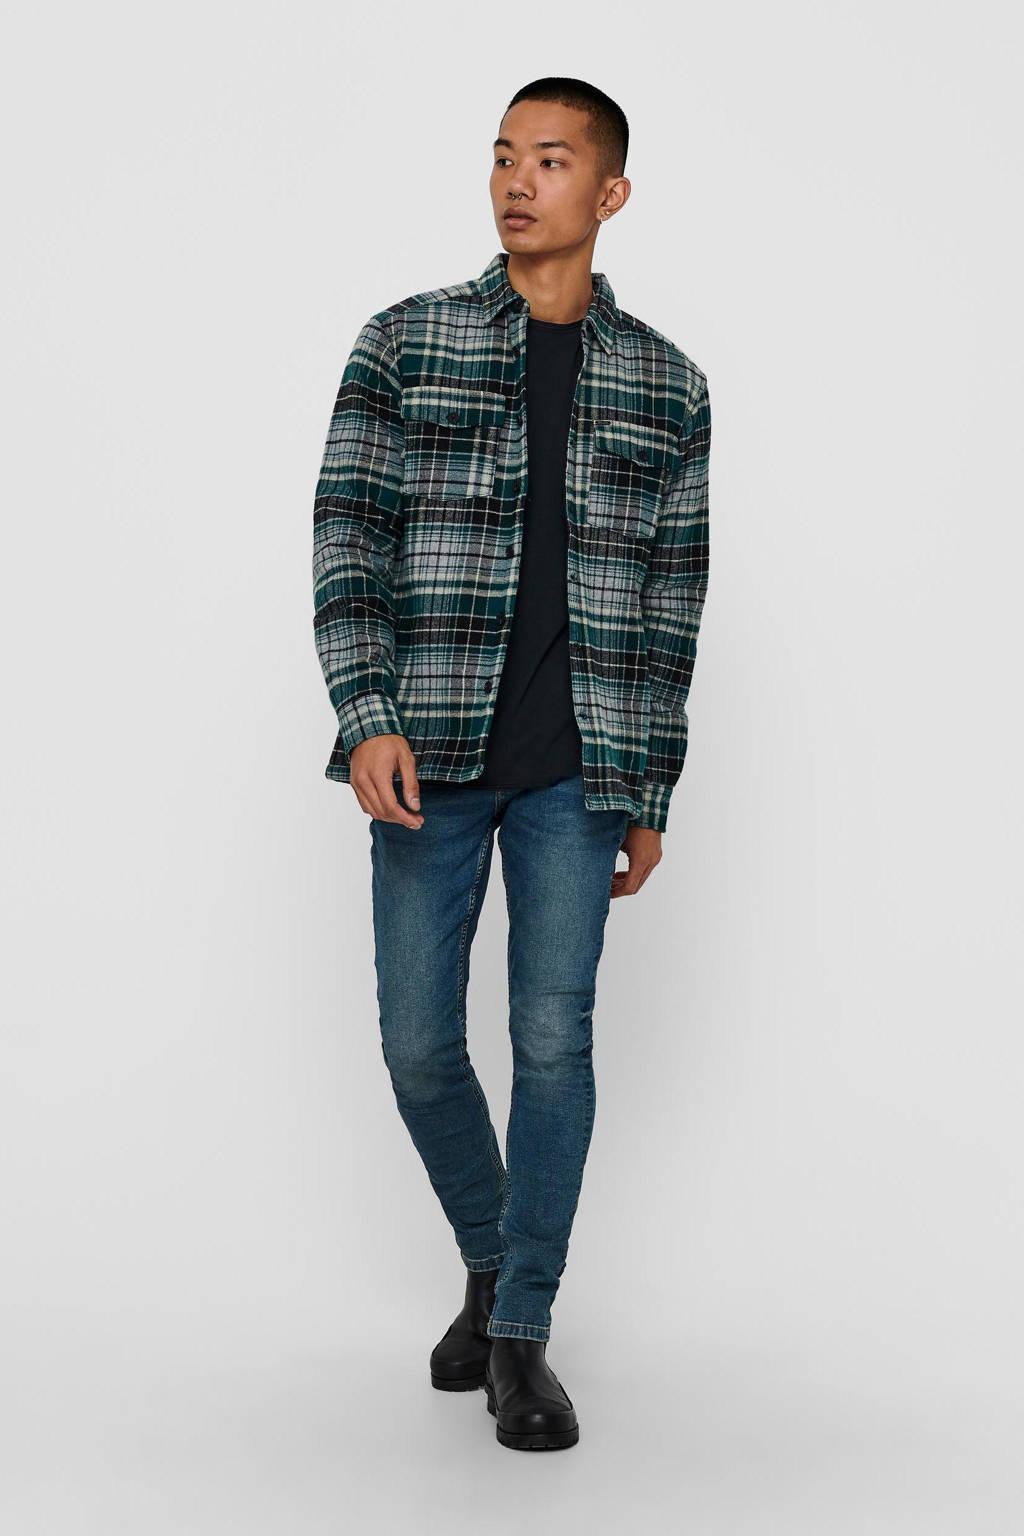 ONLY & SONS geruit flanellen regular fit overhemd grijs/groen, Grijs/groen